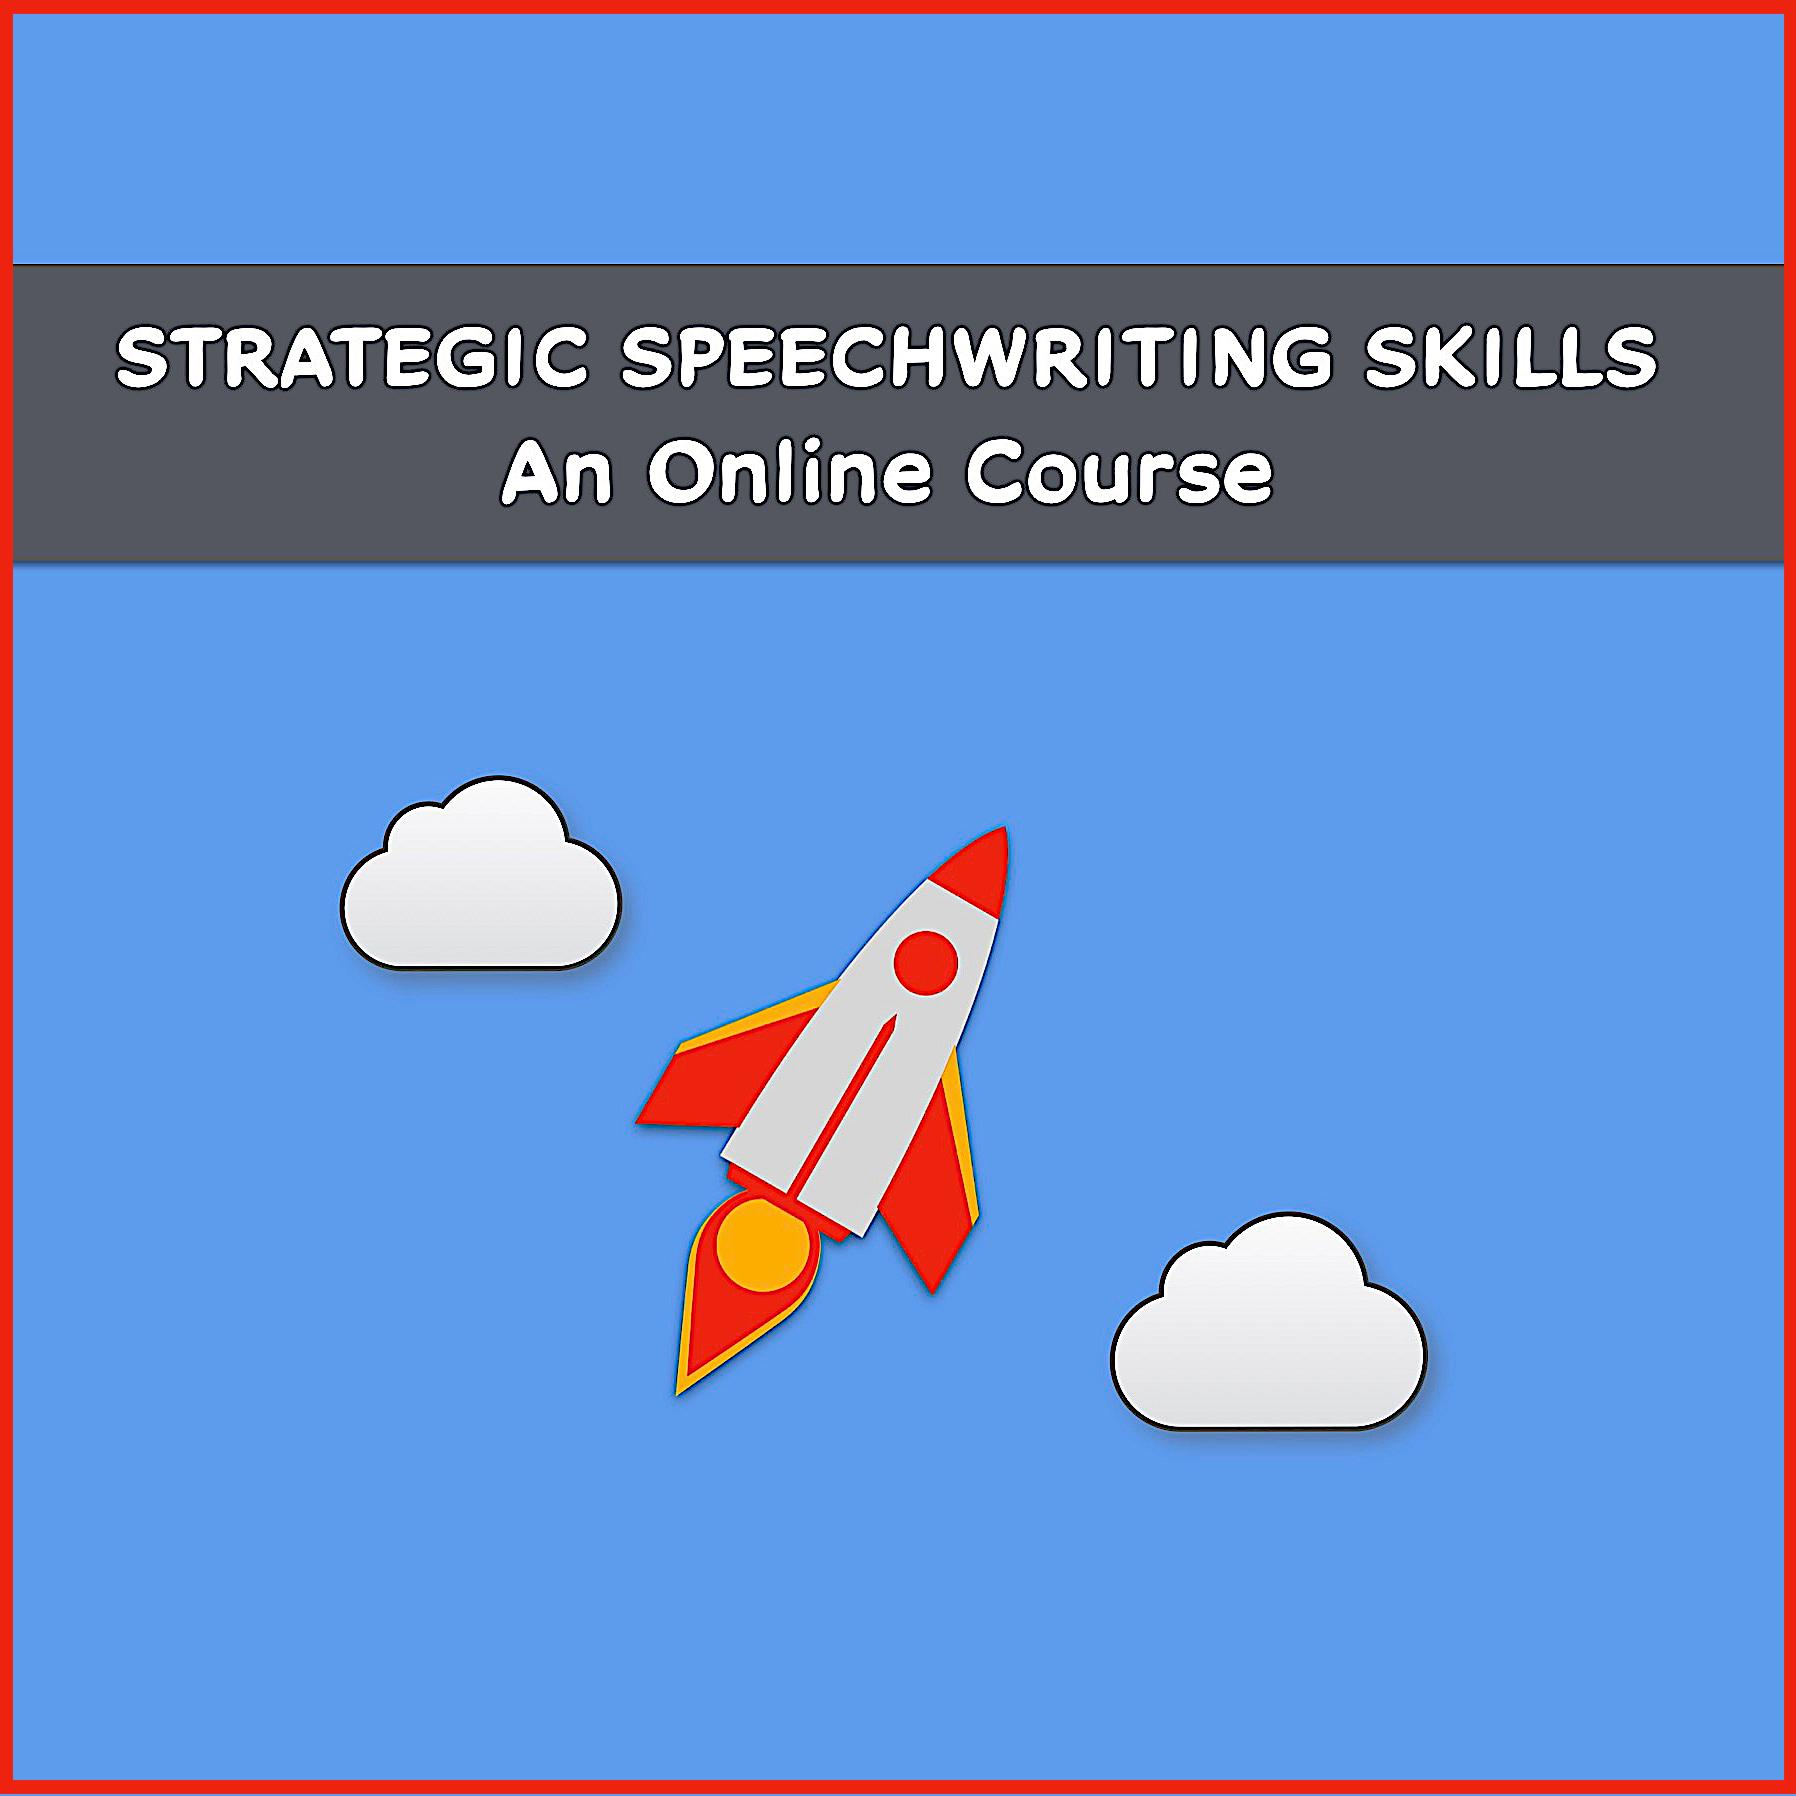 Strategic Speechwriting Skills Online Course